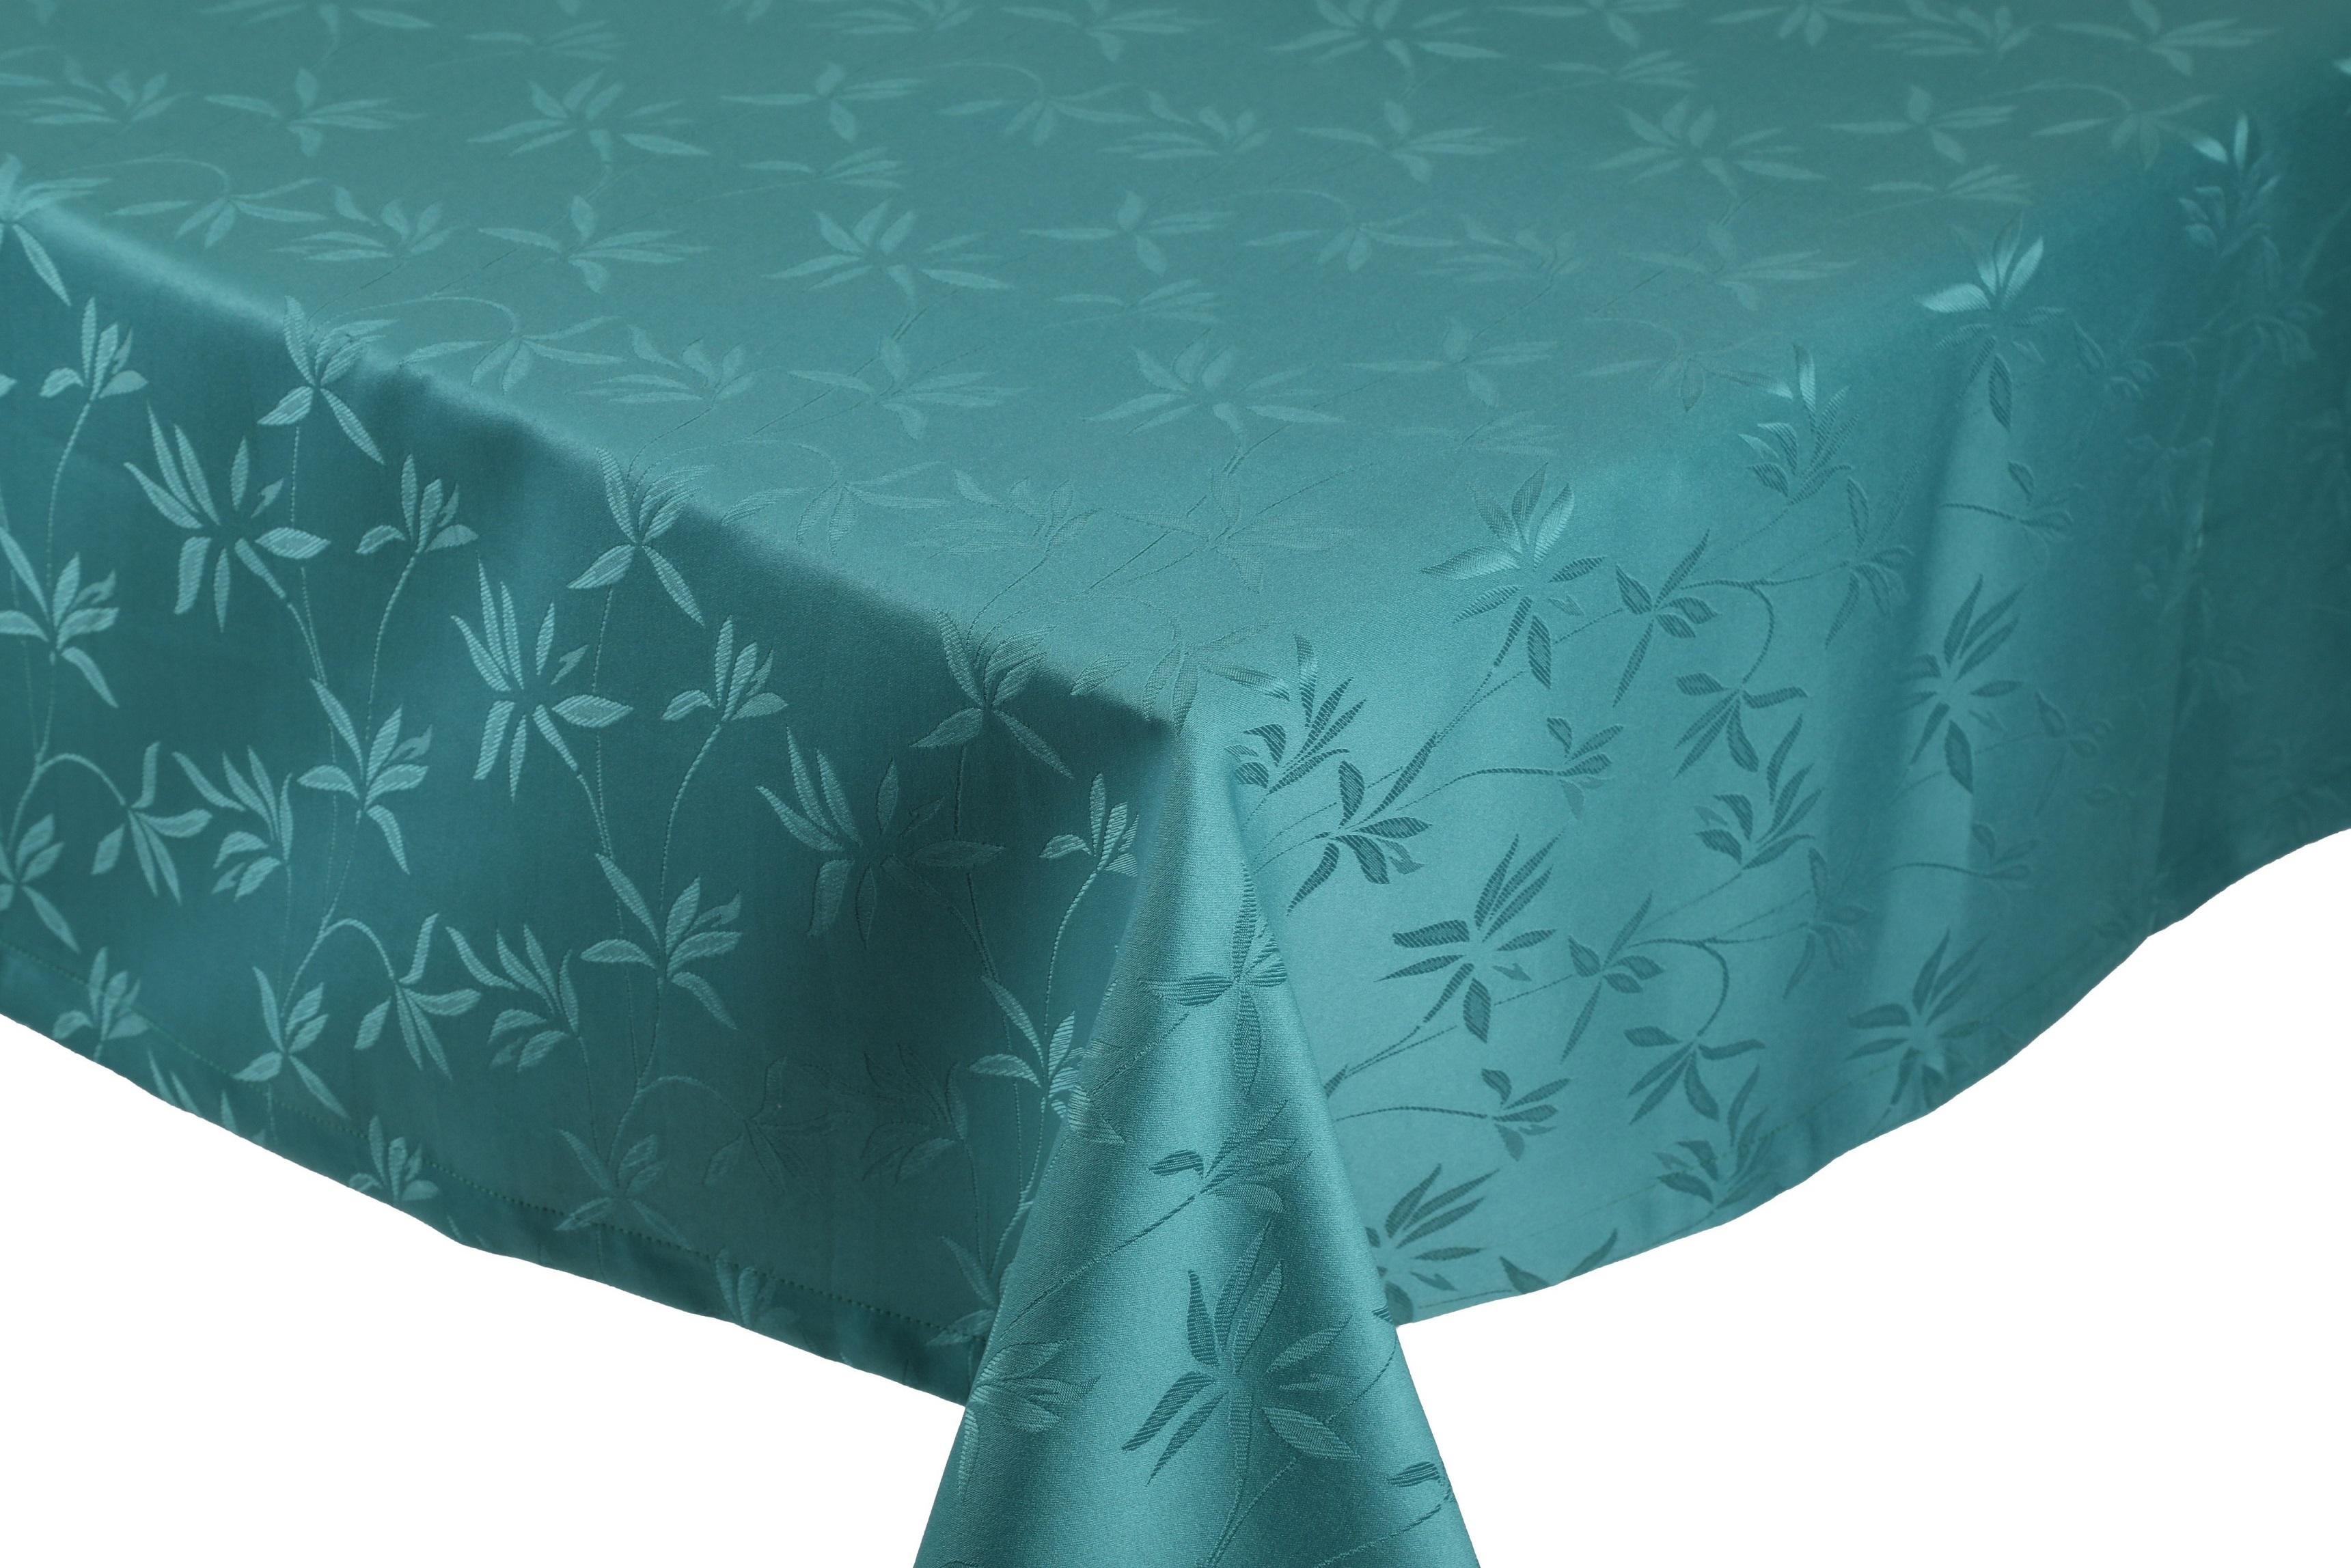 betz nappe jacquard linge de table dessin 14 couleur vert meraude. Black Bedroom Furniture Sets. Home Design Ideas